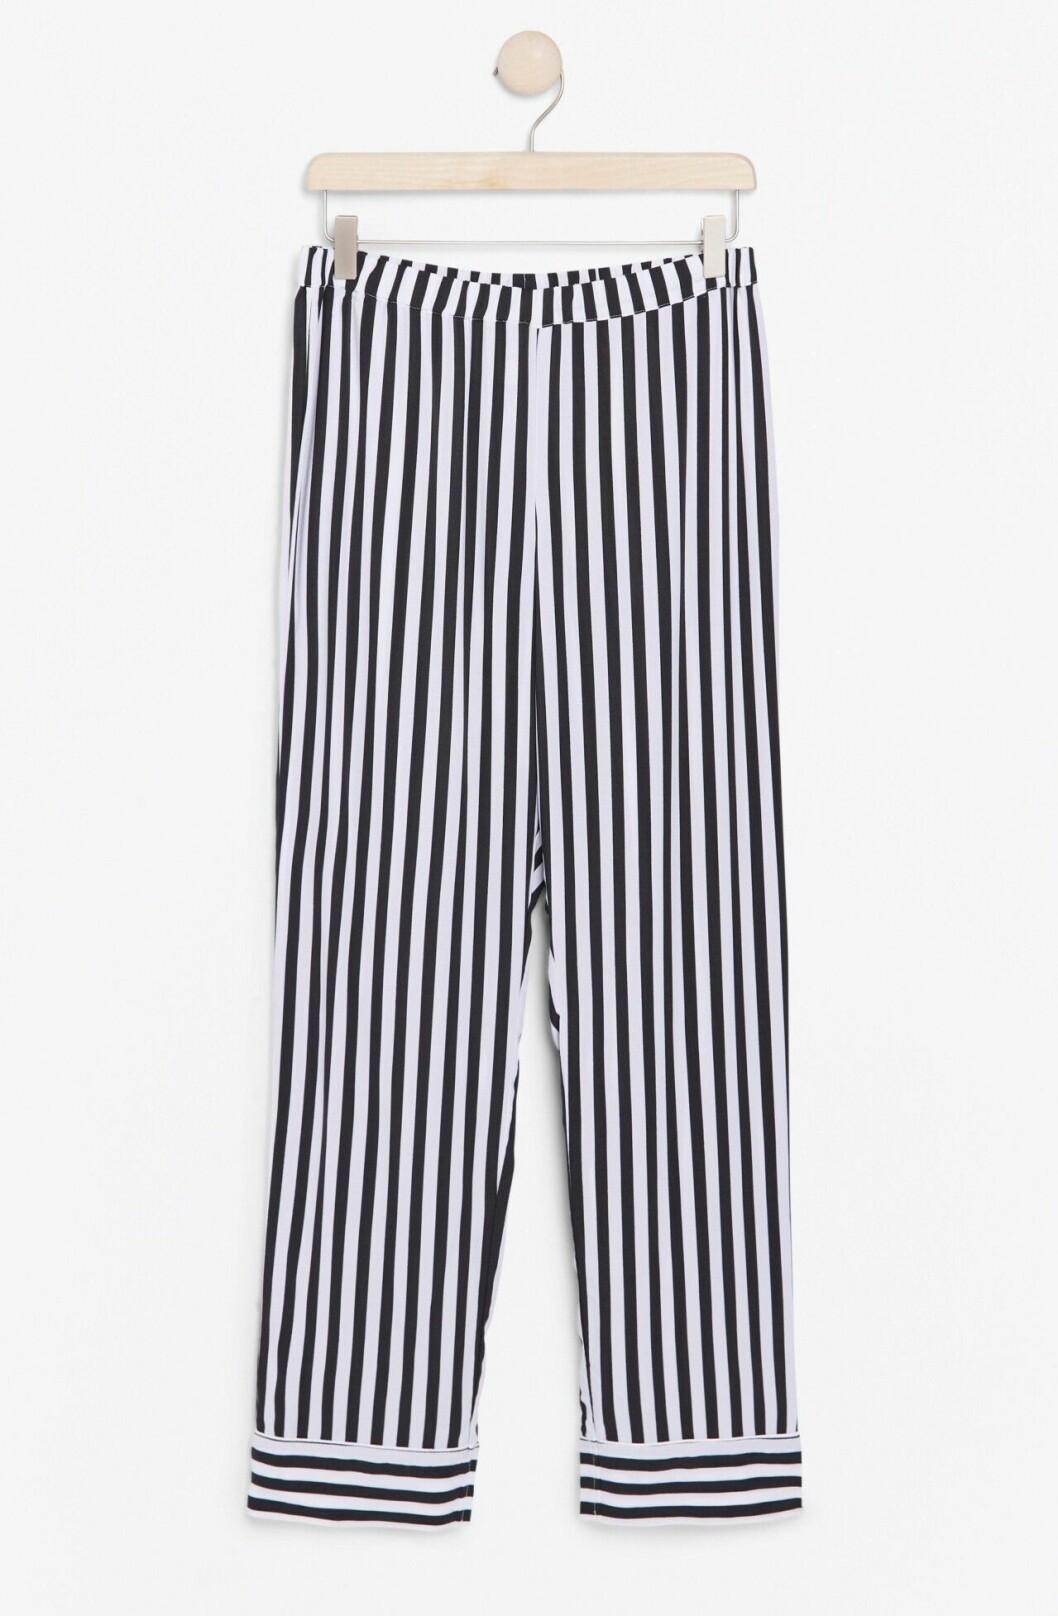 Randiga pyjamasbyxor för dam